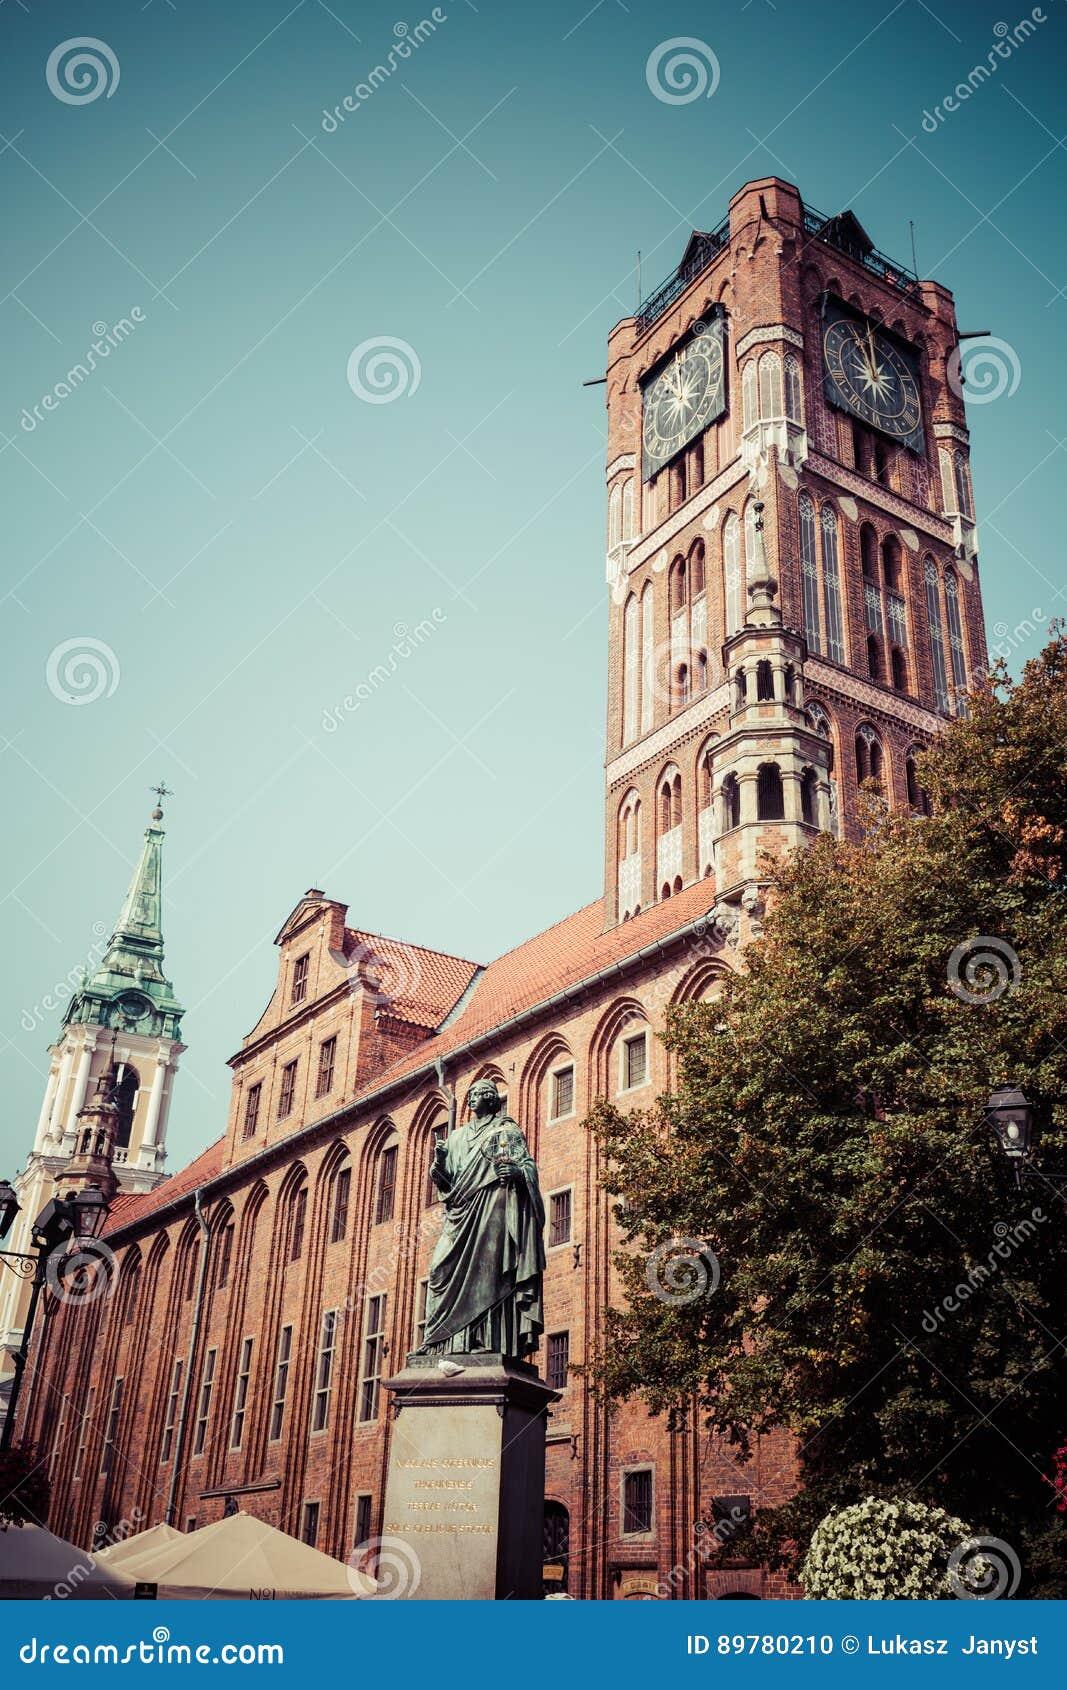 Old City Town Hall Polish: Ratusz Staromiejski Torun, Poland.